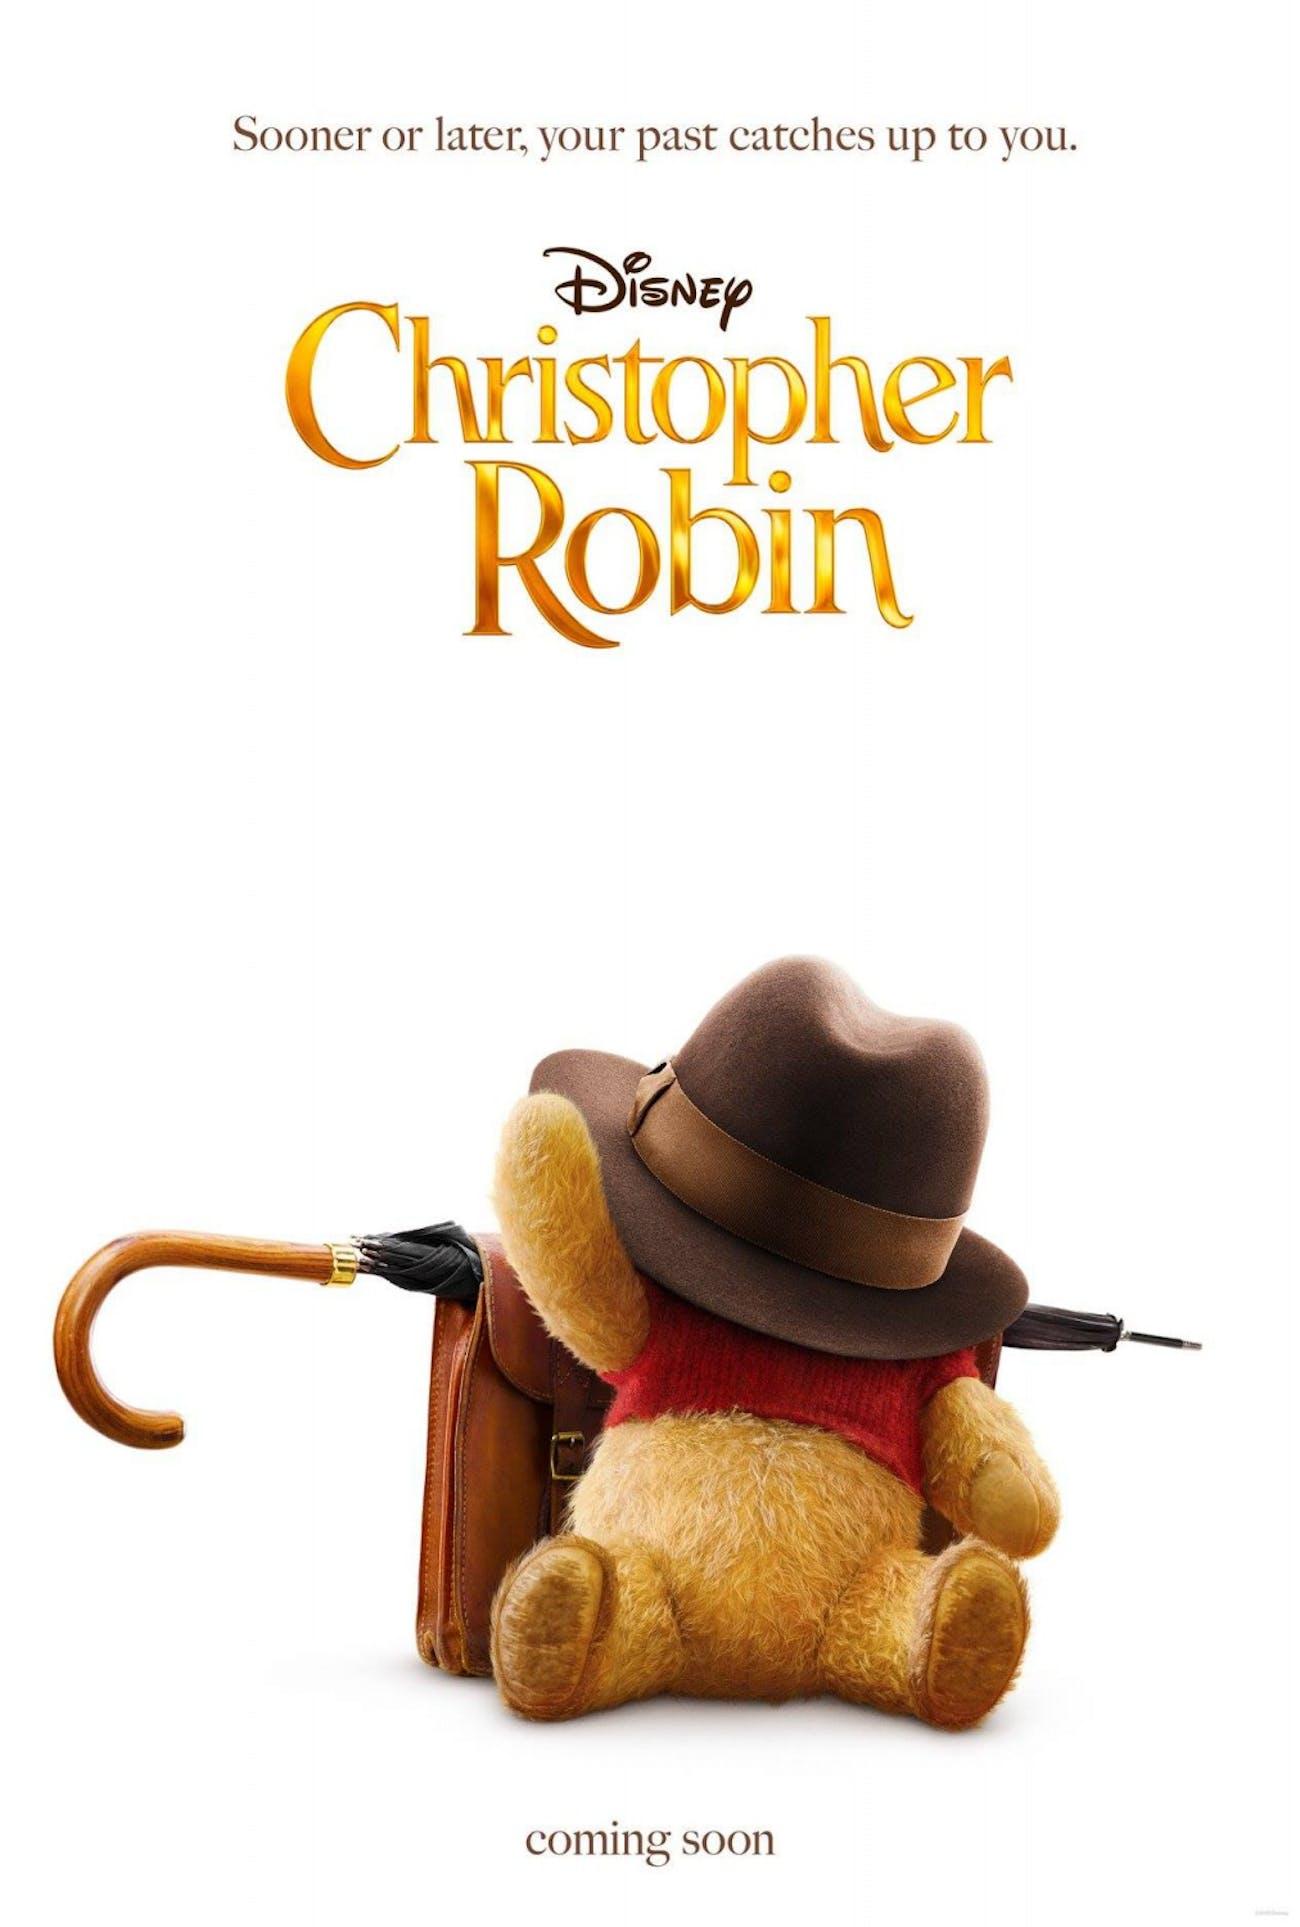 Winnie the Pooh Christopher Robin